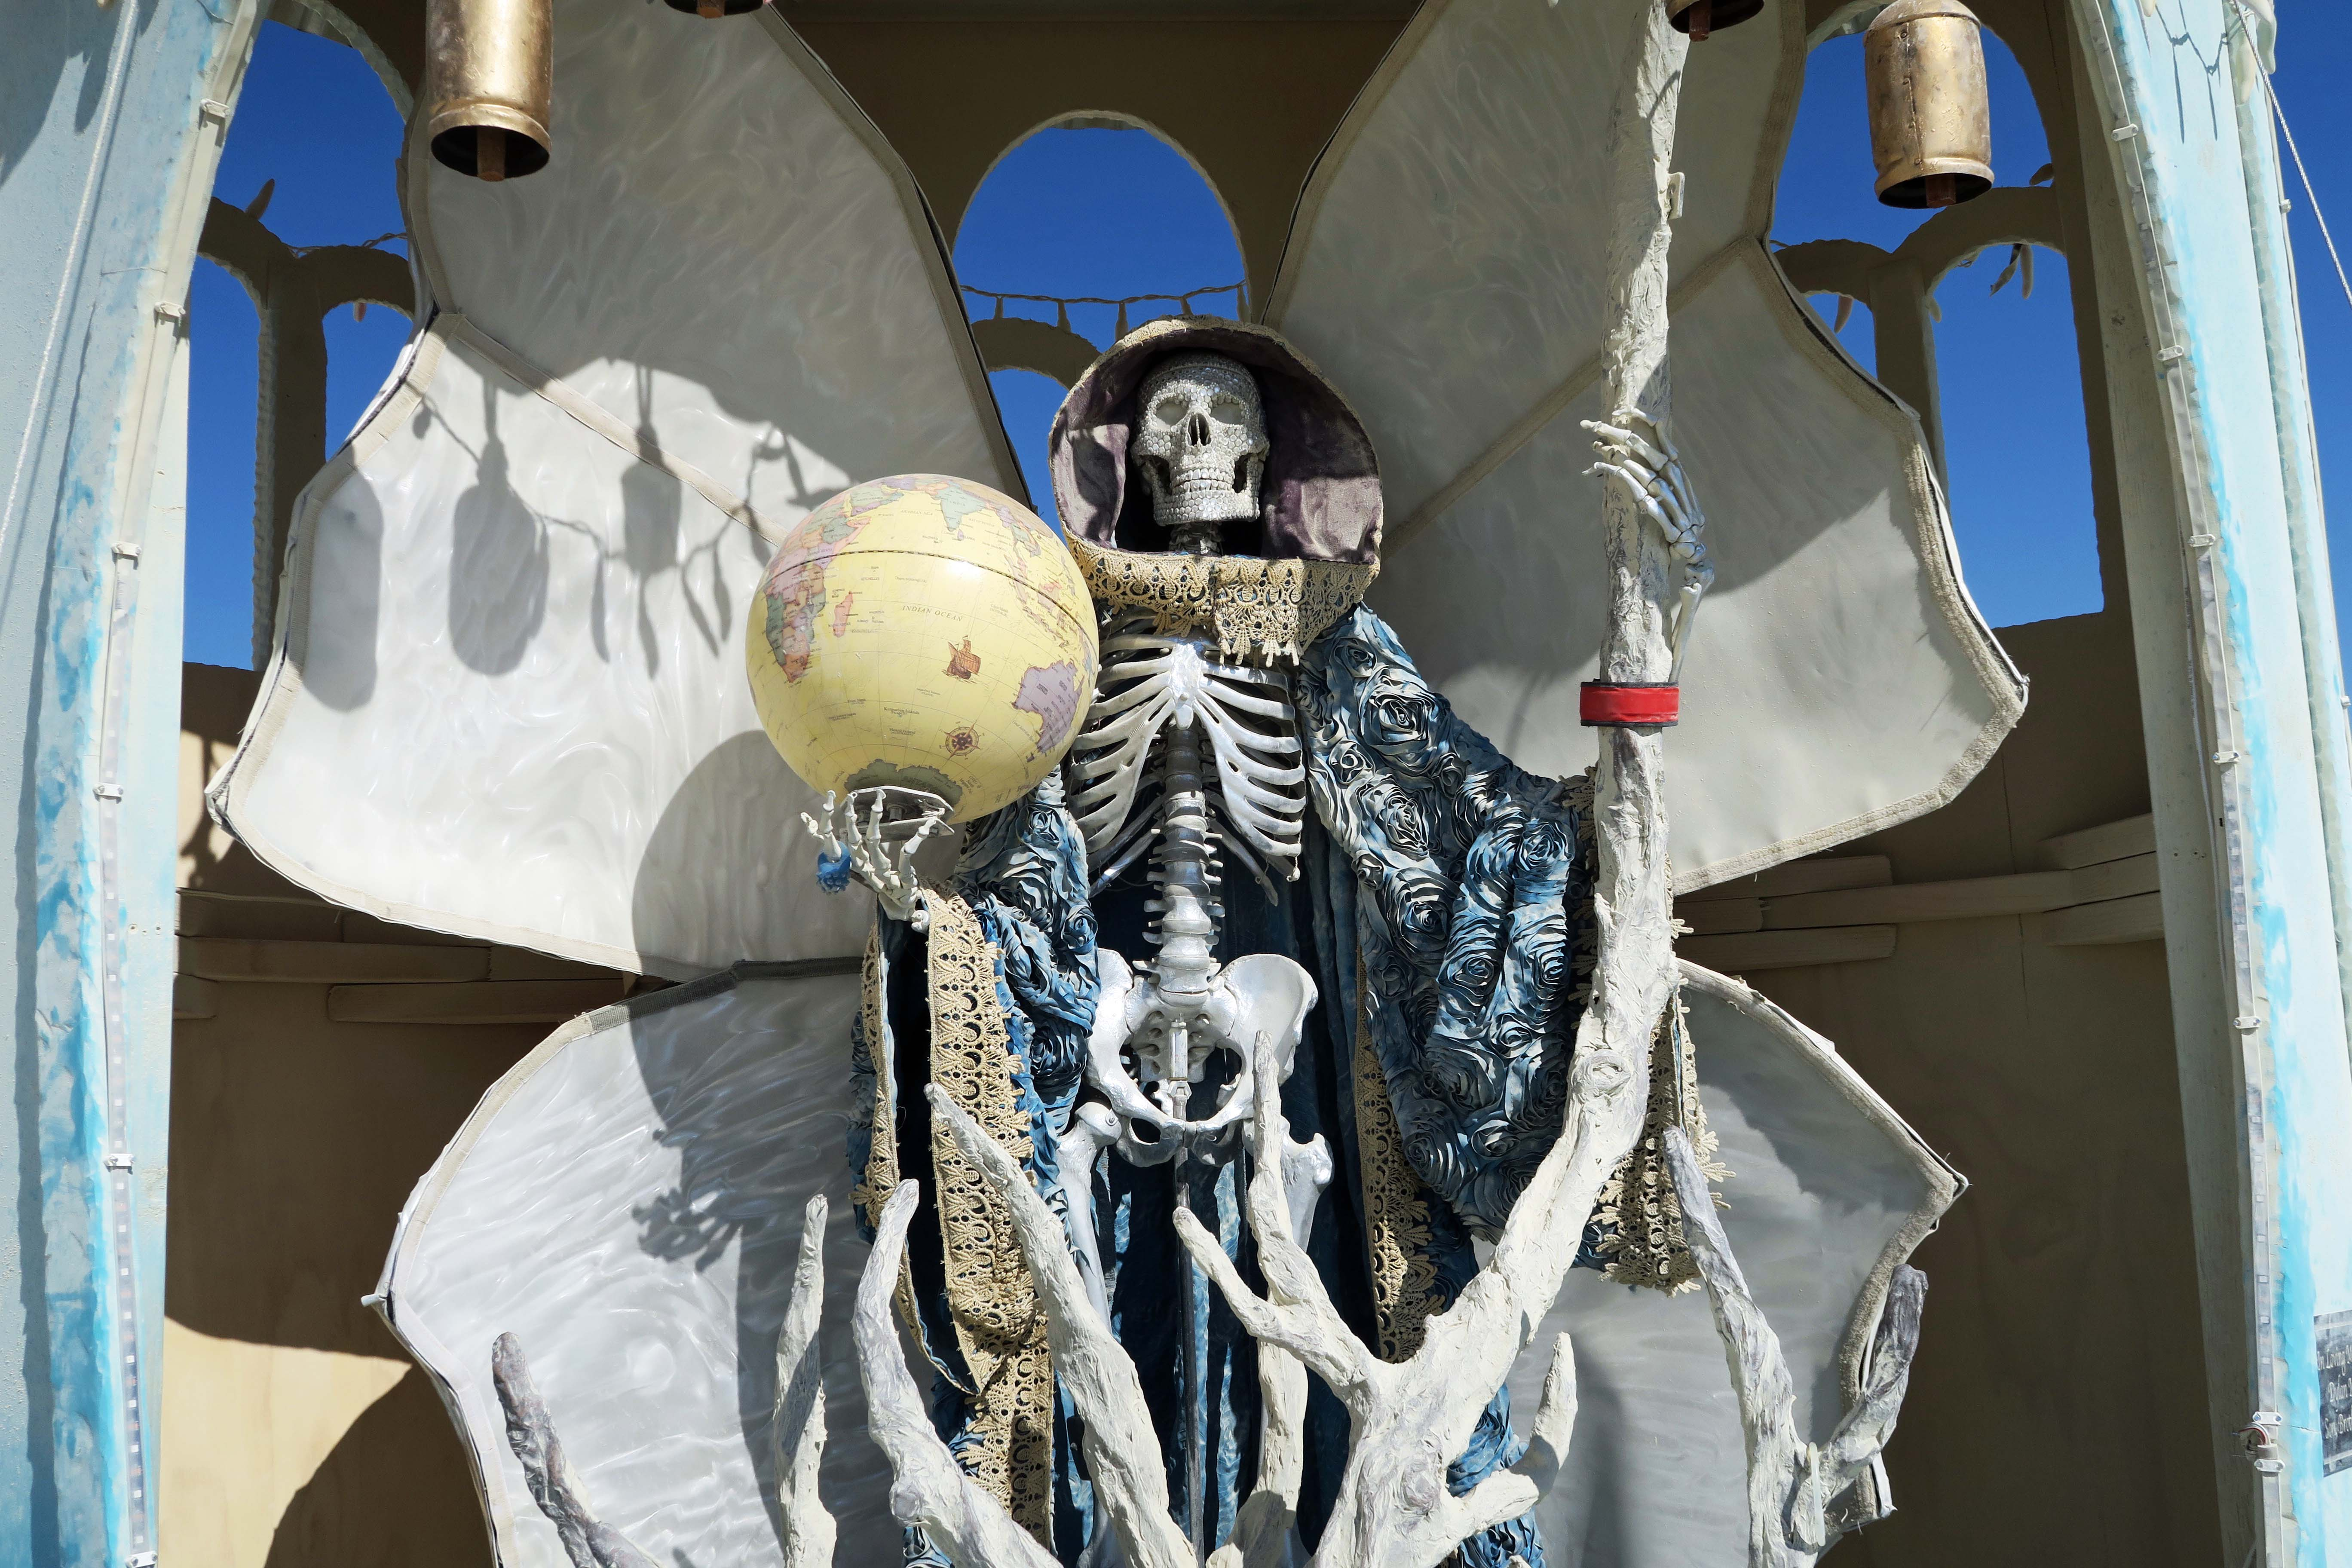 Shrine of La Santisima Muerte at Burning Man 2017